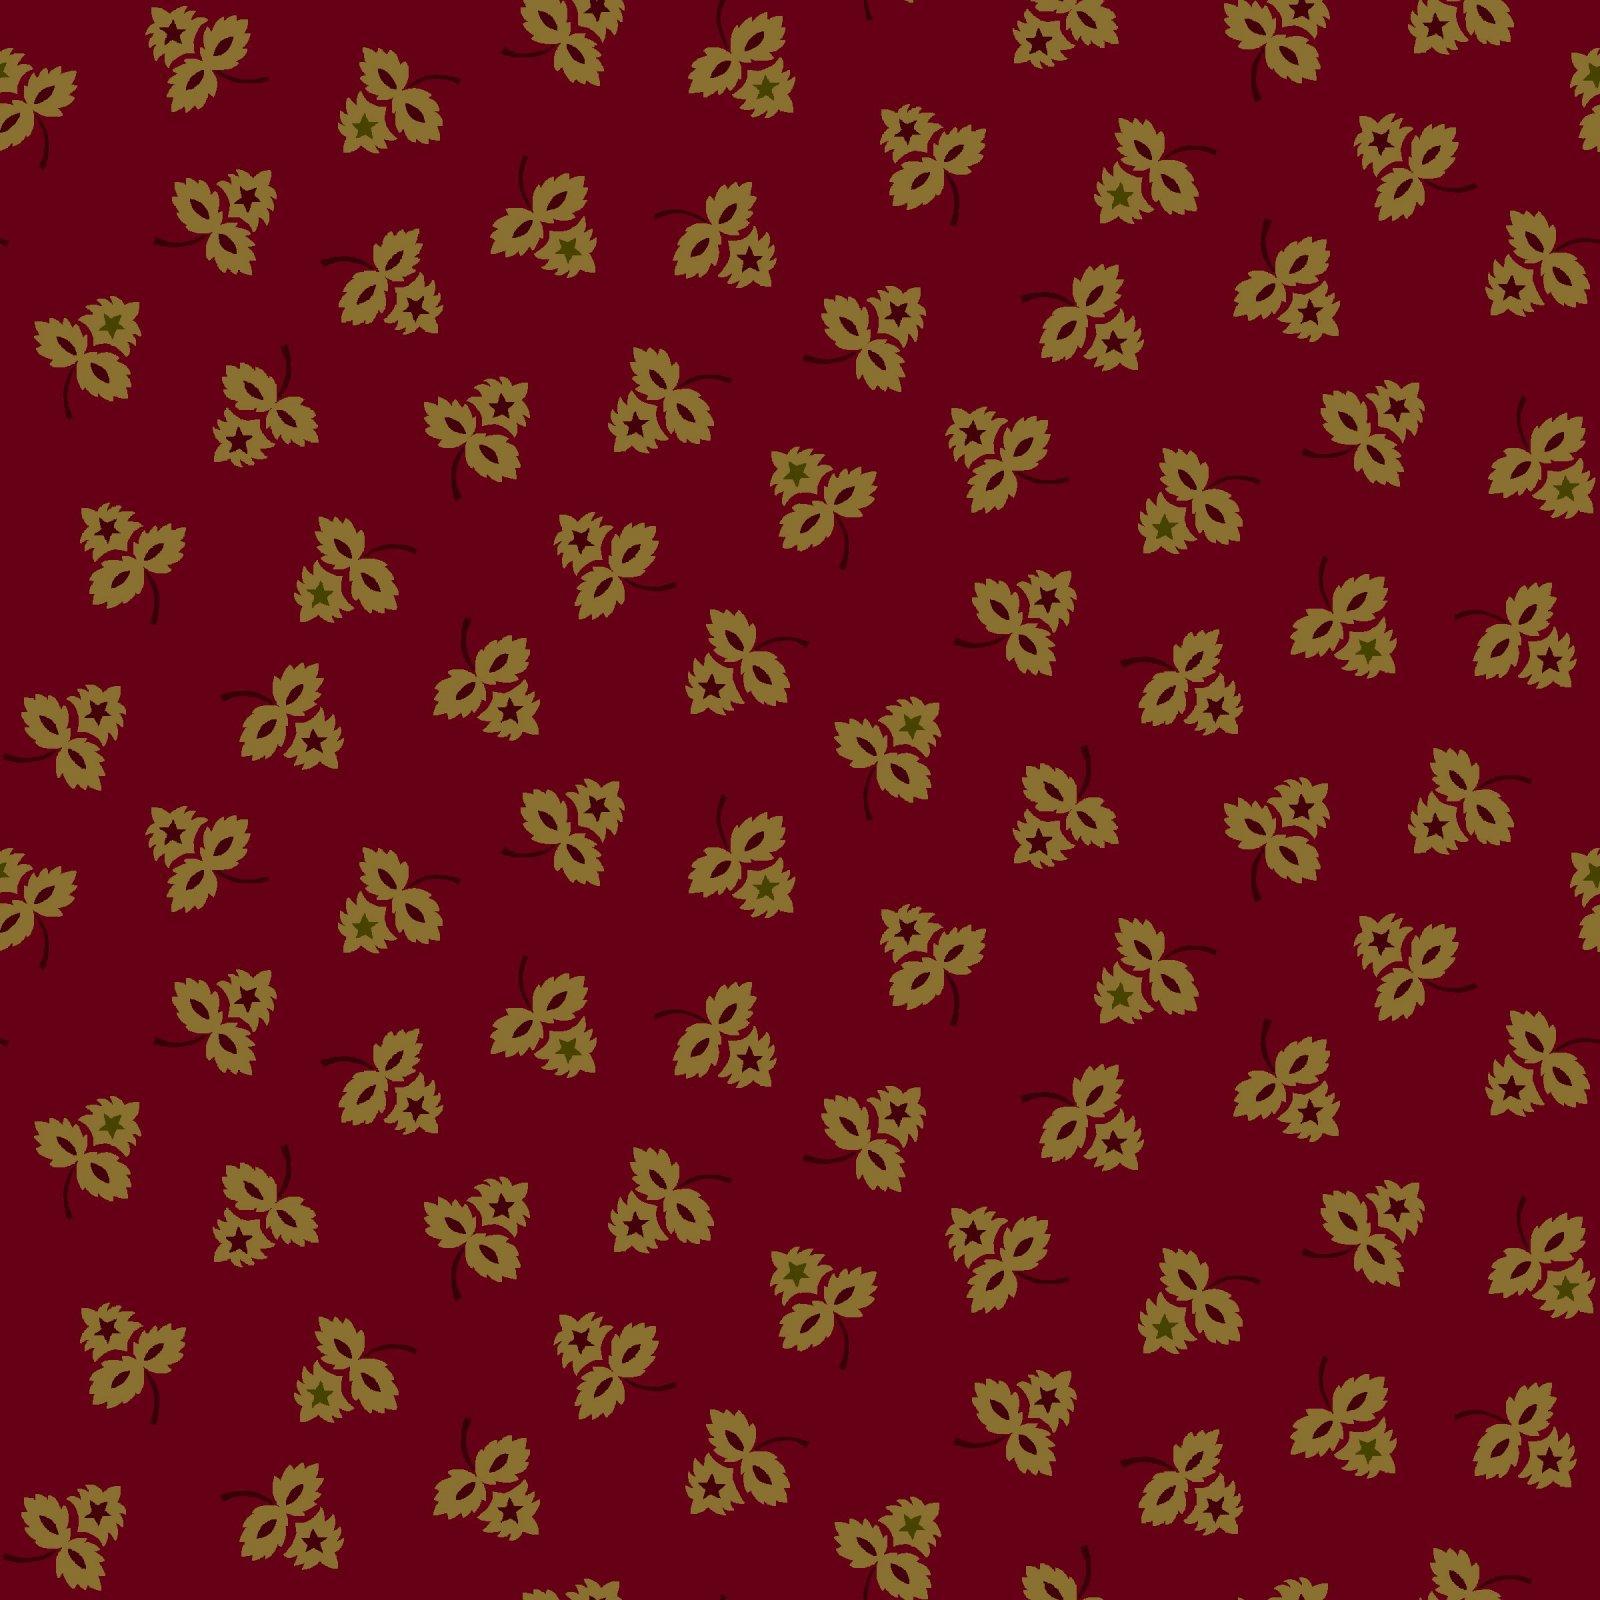 HG-Farmhouse Christmas 9682-88 Red - Three Leaf Clusters